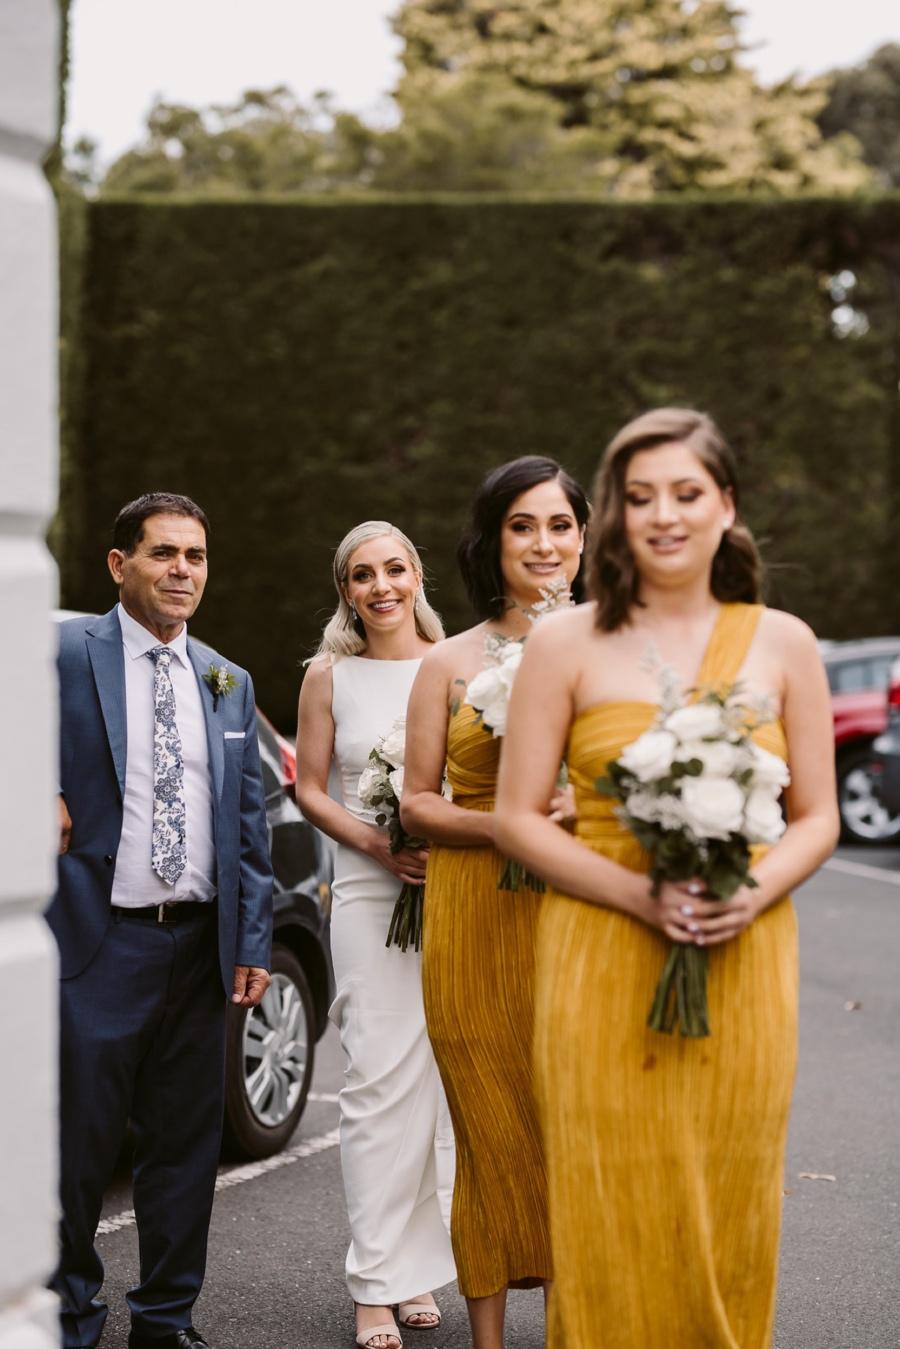 Quat Quatta Melbourne Wedding Photography48.jpg